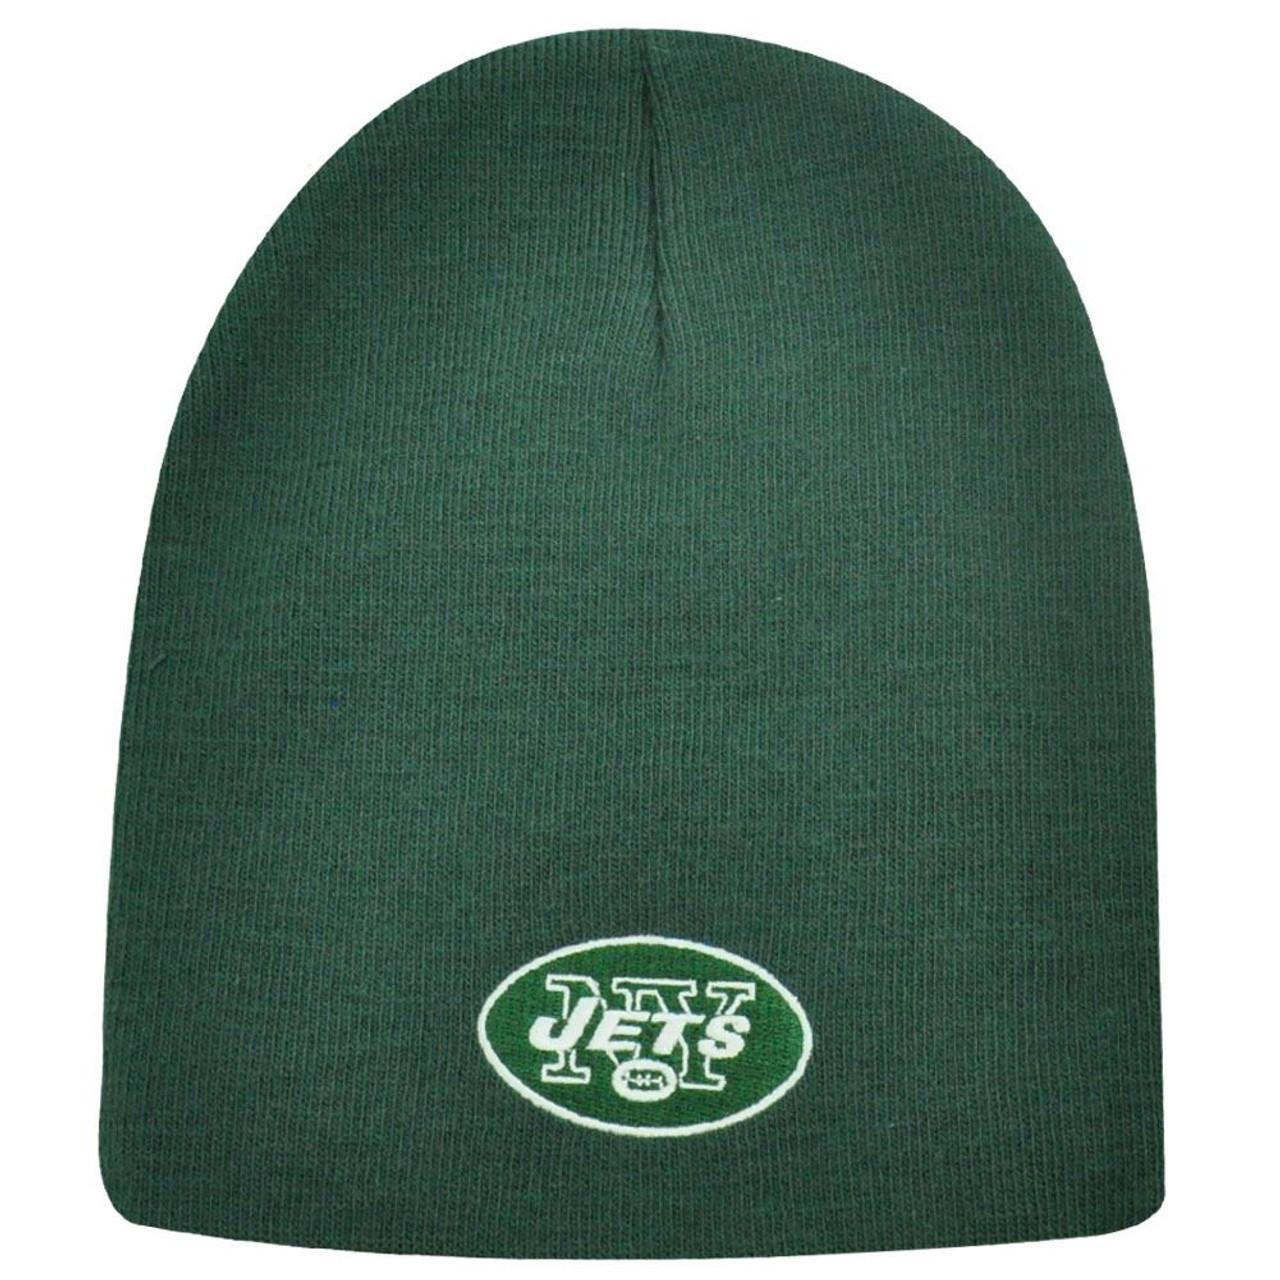 2d312aa6f82 NFL CUFFLESS BEANIE KNIT HAT NEW YORK JETS GREEN NEW - Cap Store Online.com